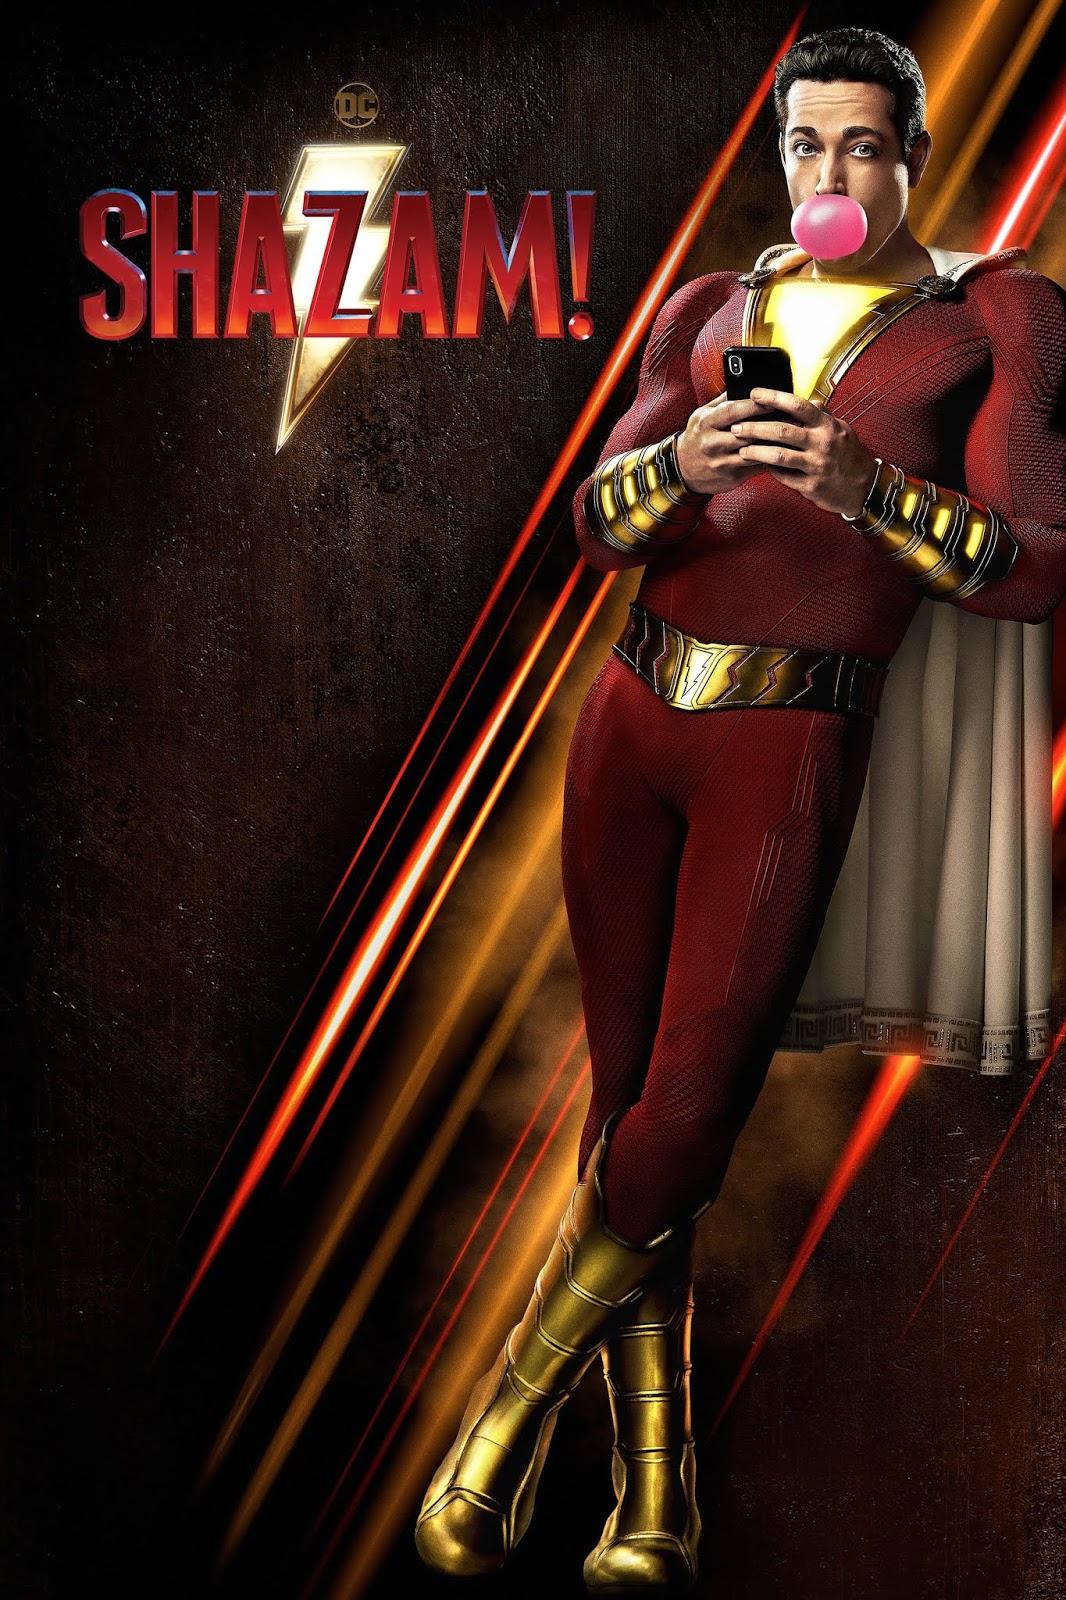 SHAZAM (2019) TAMIL DUBBED HD